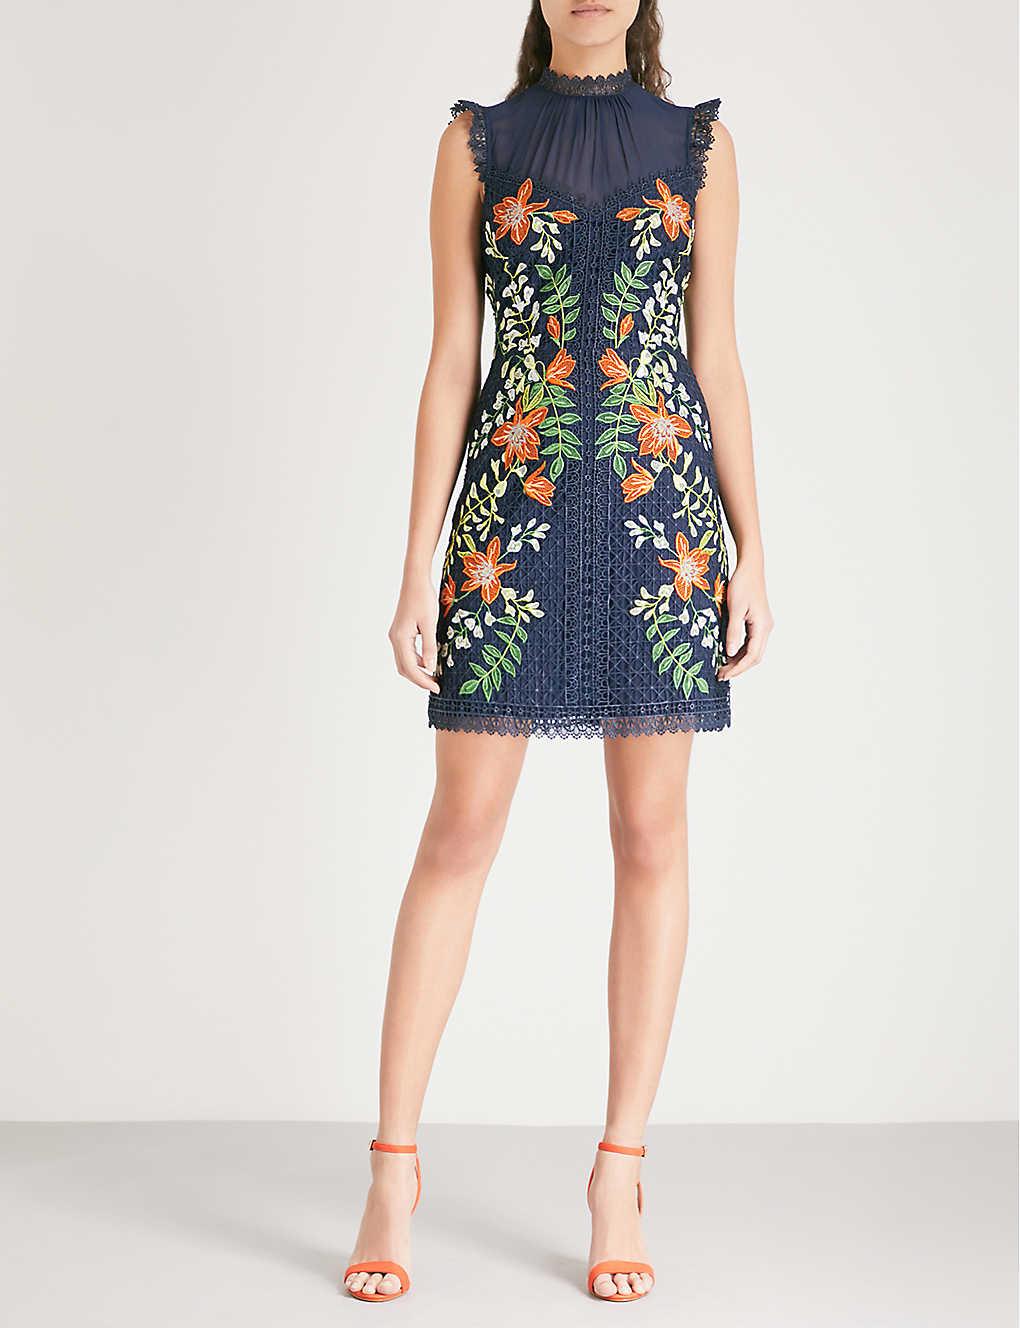 d1eadf1353 KAREN MILLEN - Wisteria lace dress